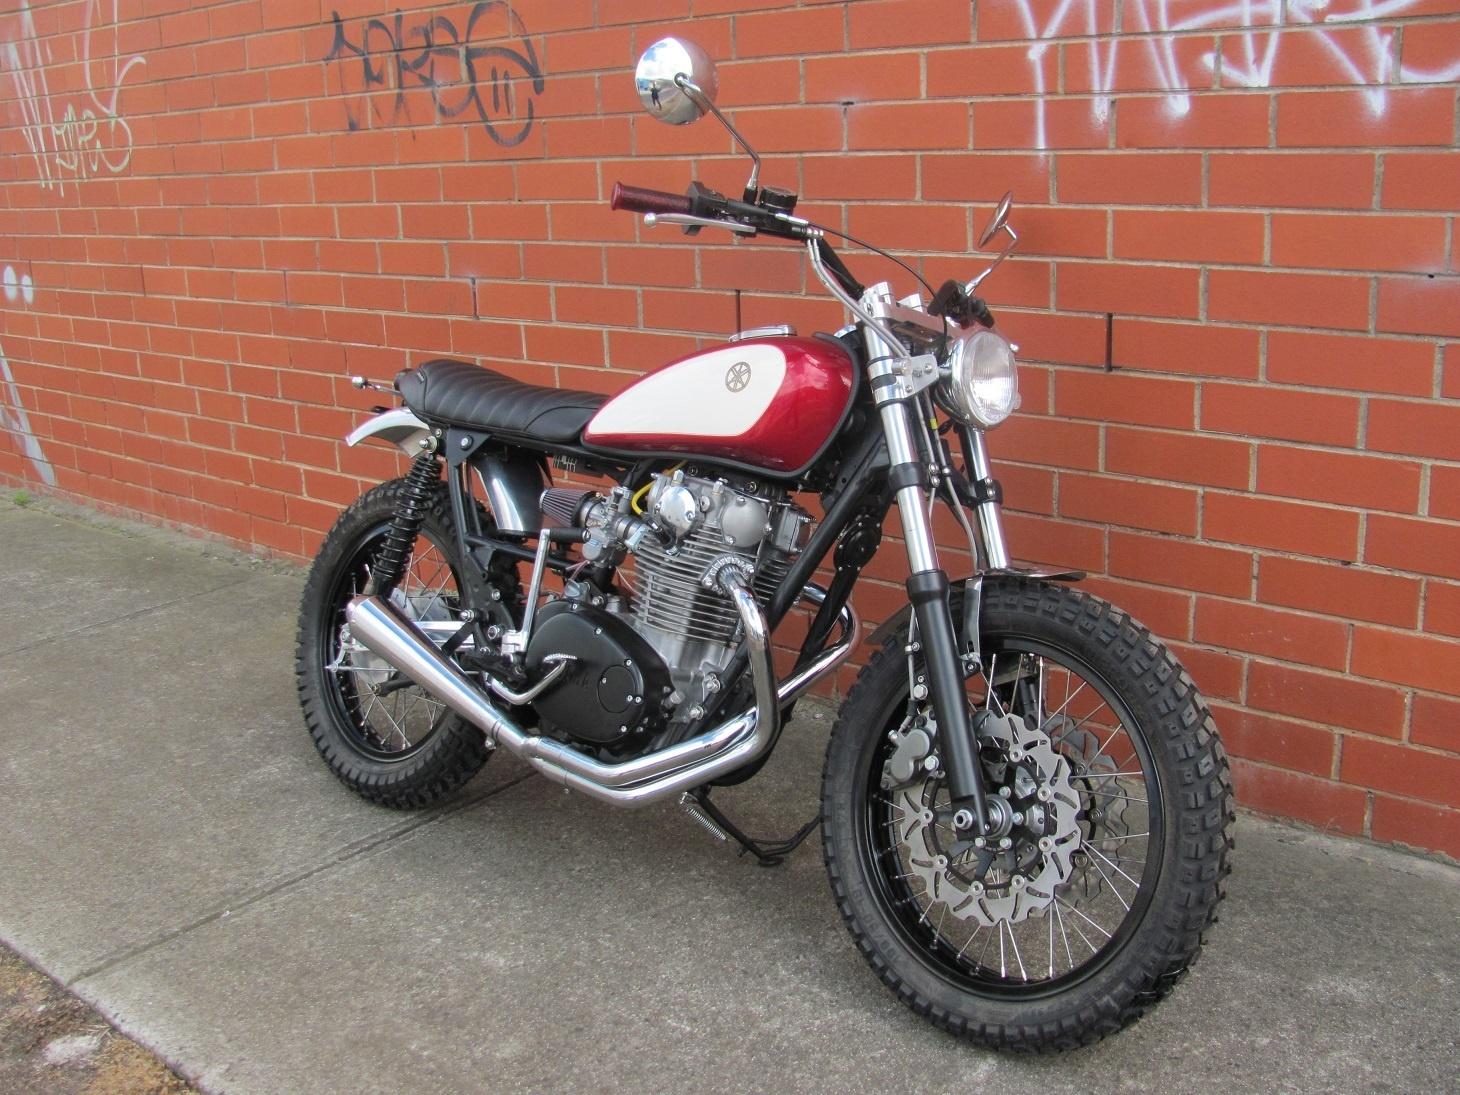 Dry Clutch Thexscafe Racer 2stroke Tz250h Yamaha Motorcycle Carburetor Diagram And Parts Street Scrambler